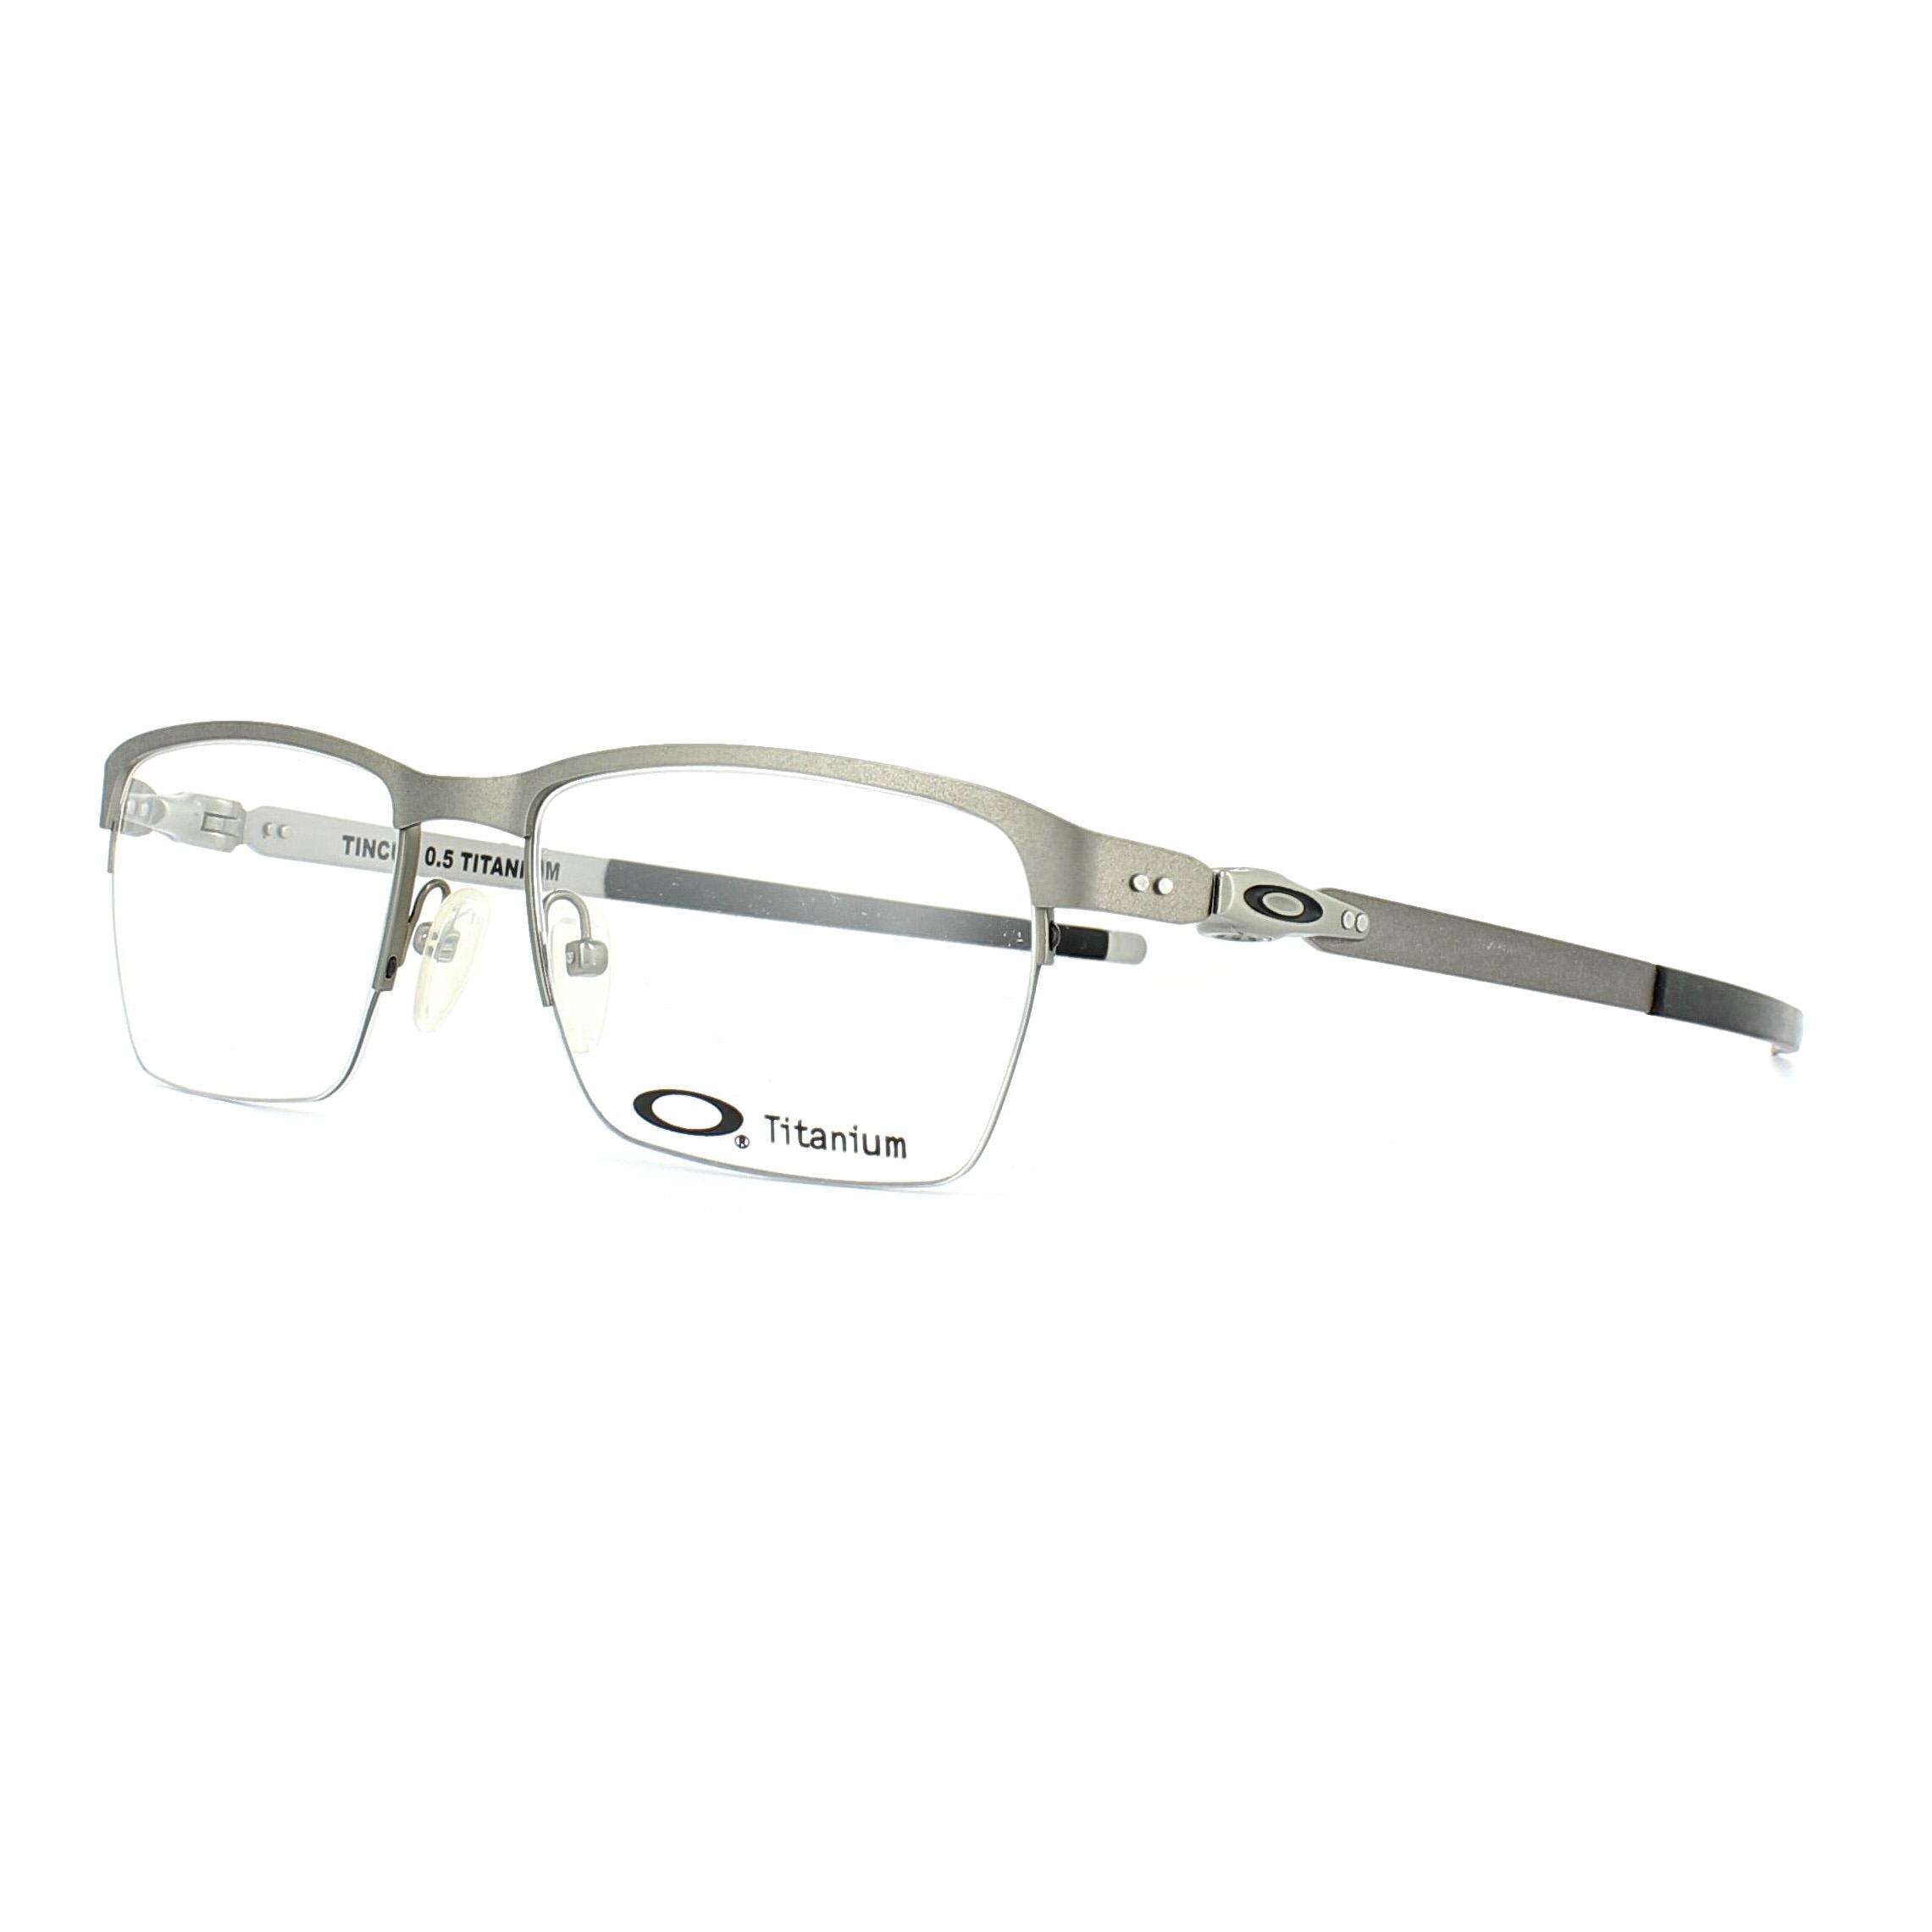 b36cae5c6709c Sentinel Oakley Glasses Frames Tincup 0.5 OX5099-02 Powder Steel 51mm Mens